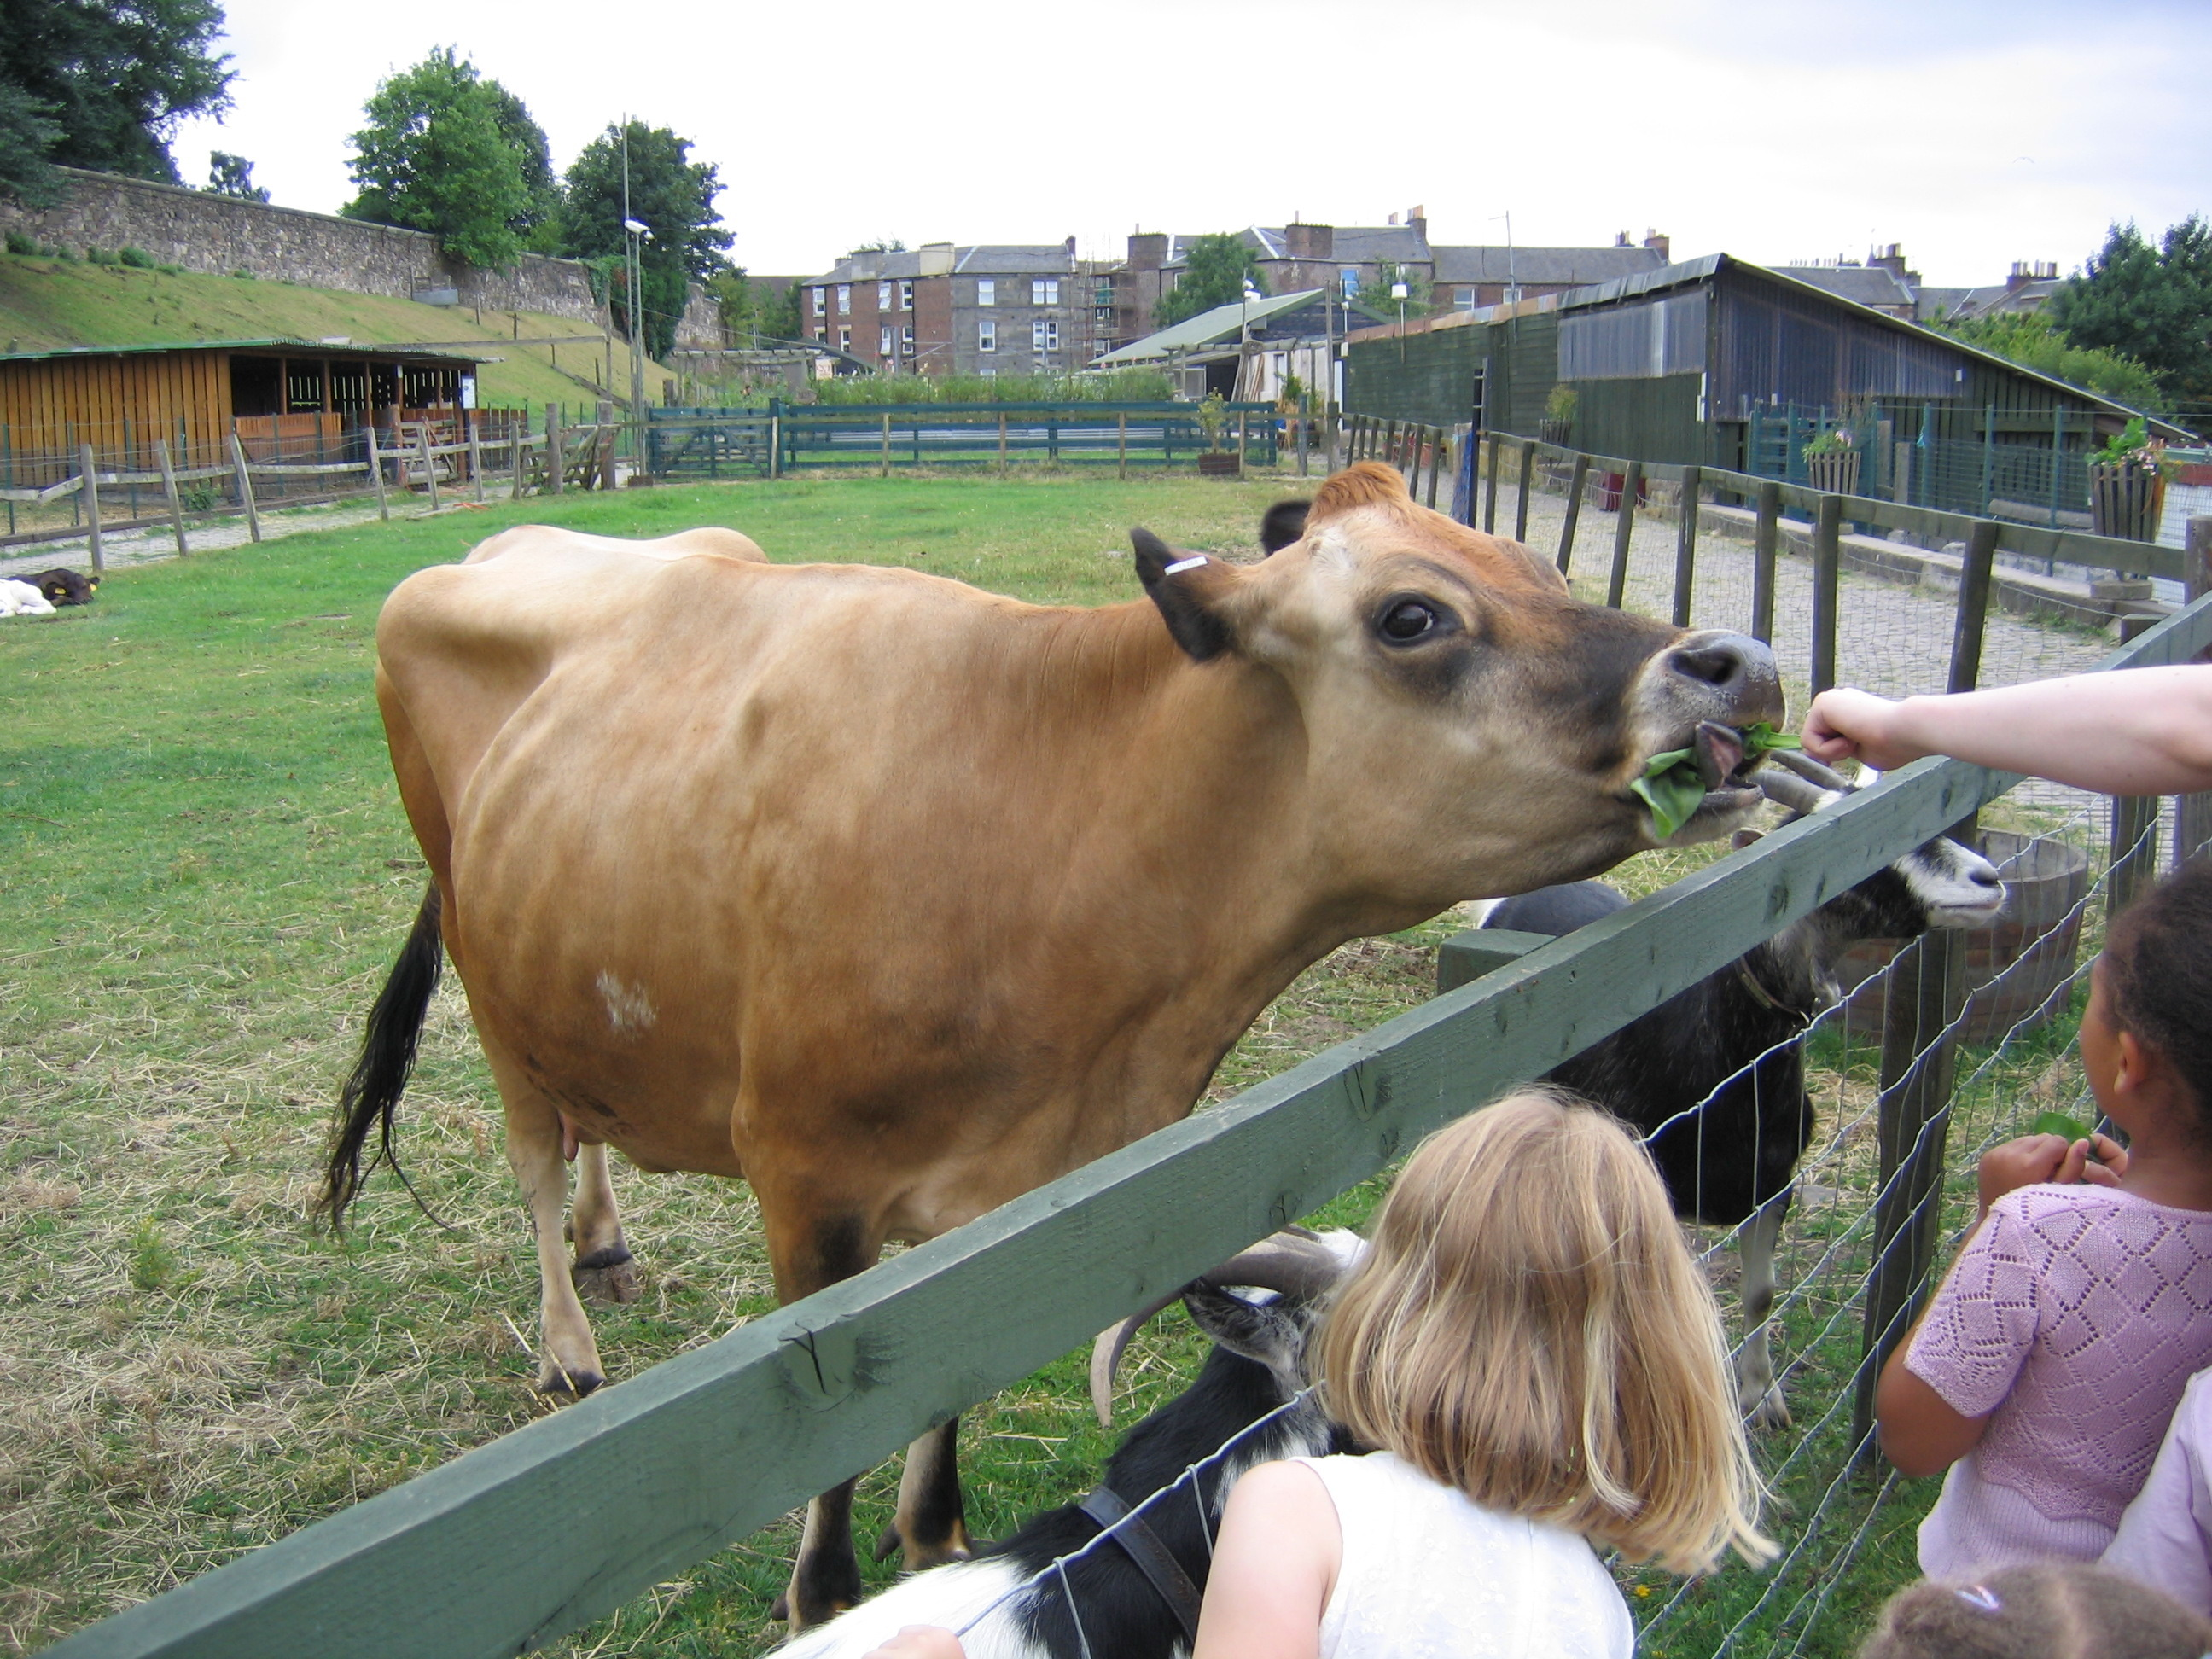 Friendly Jersey cow at Gorgie City Farm